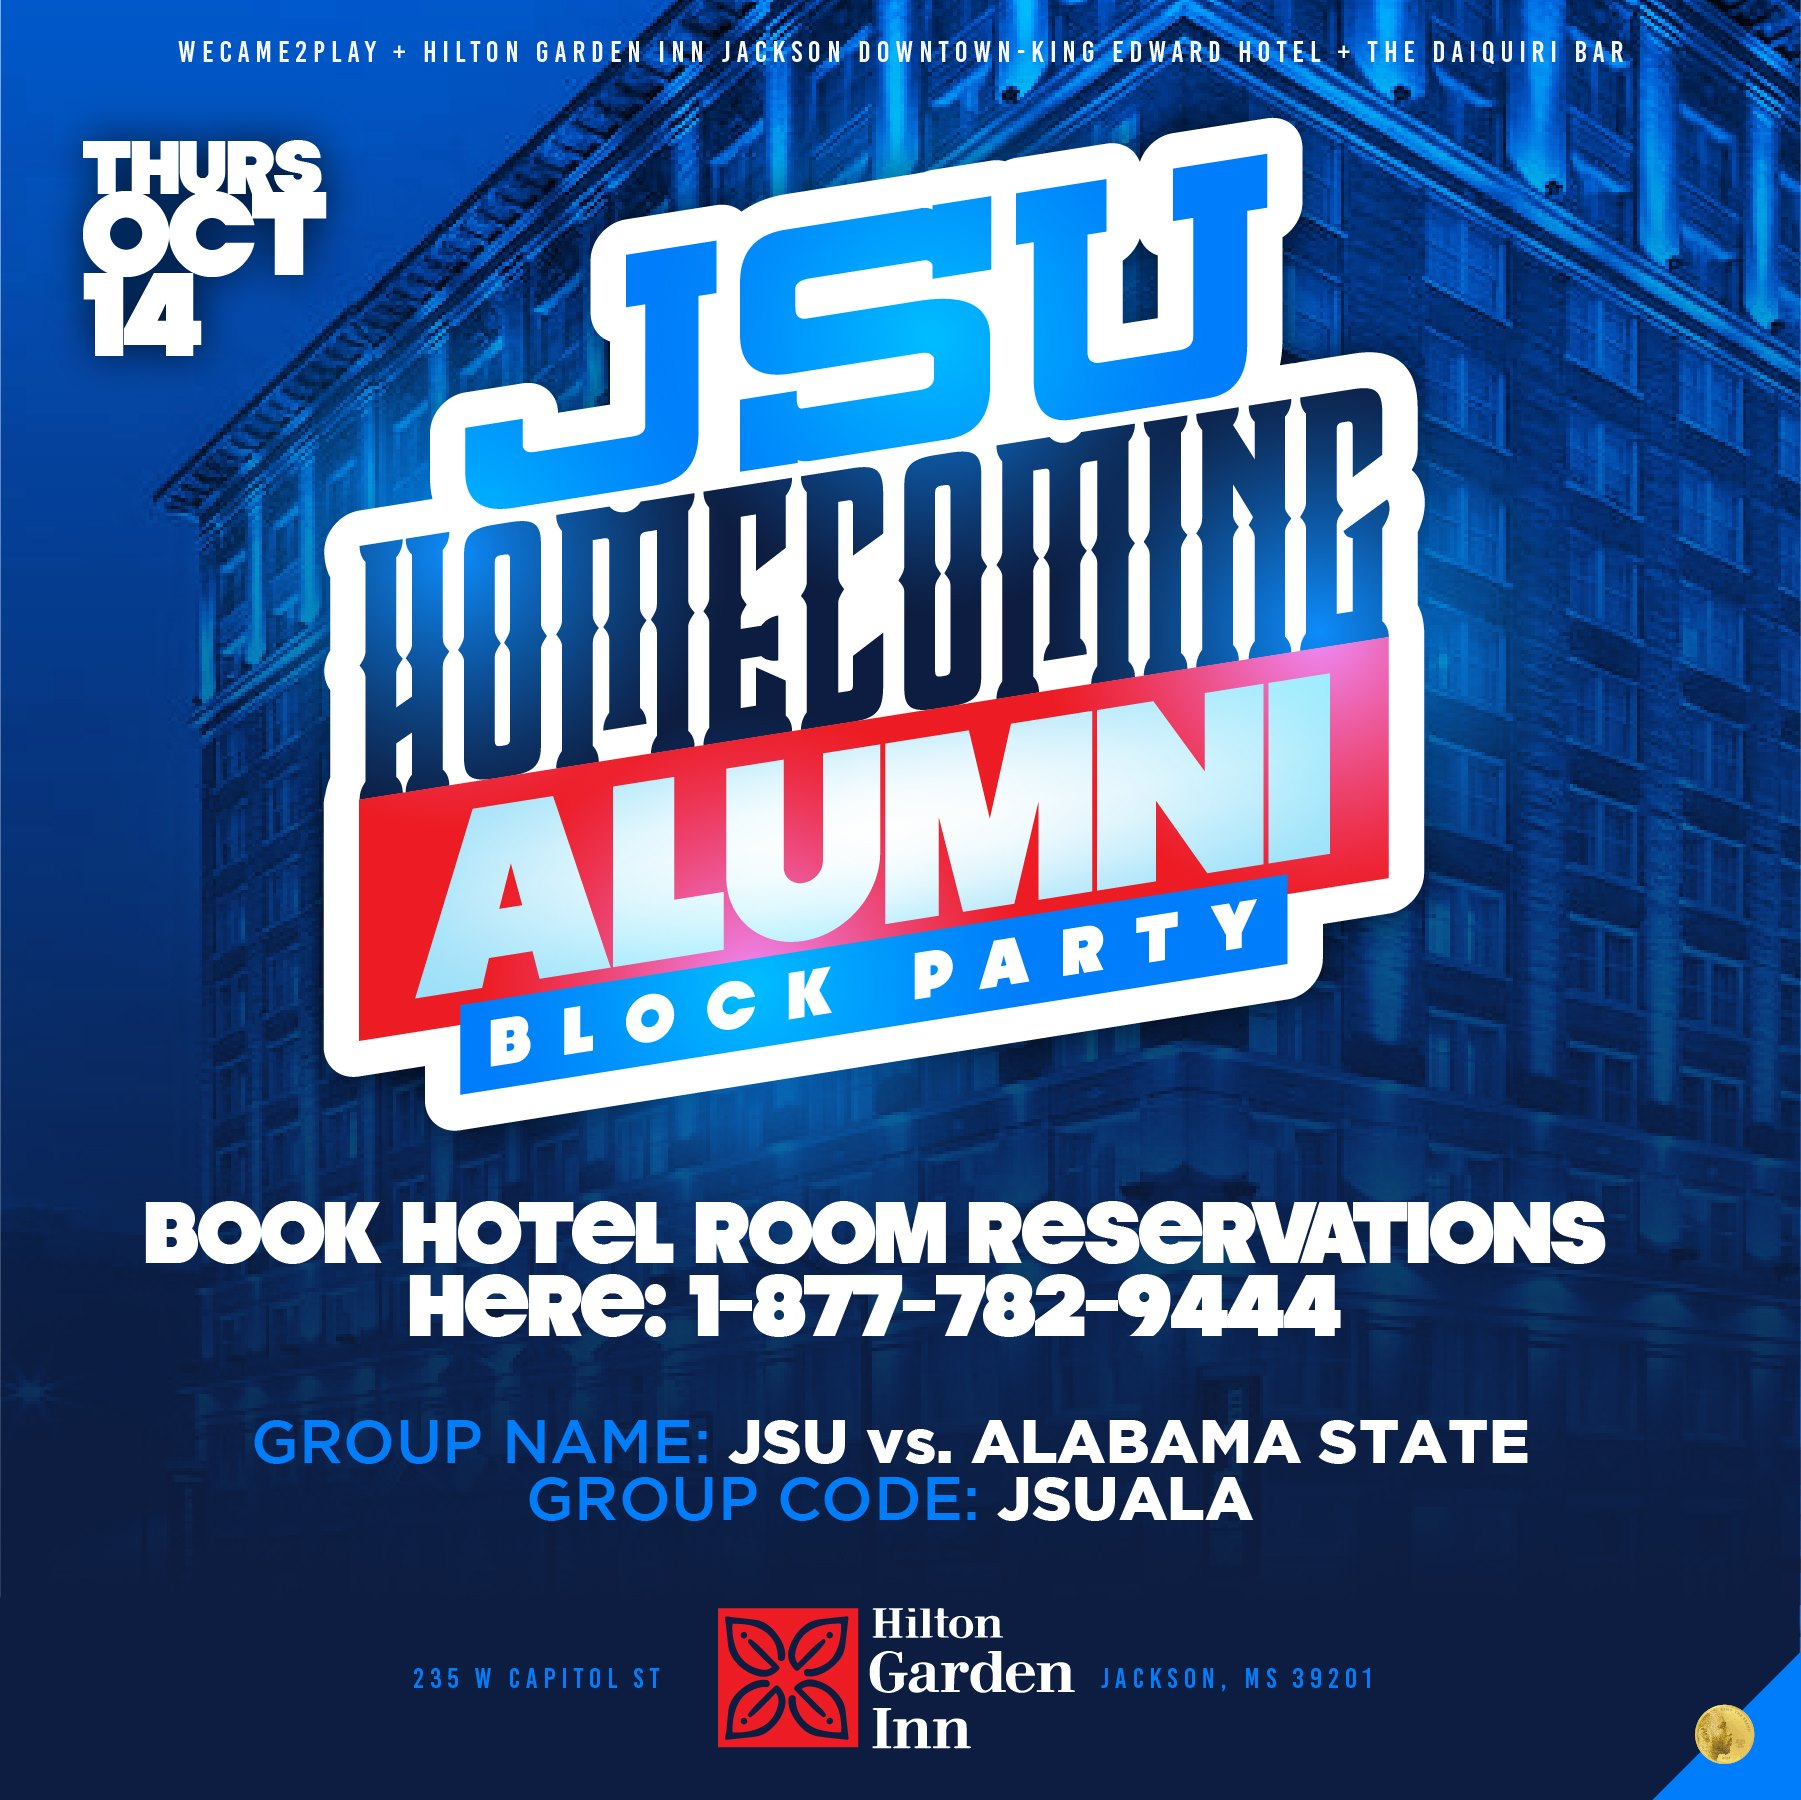 THEE JSU Homecoming Alumni Block Party